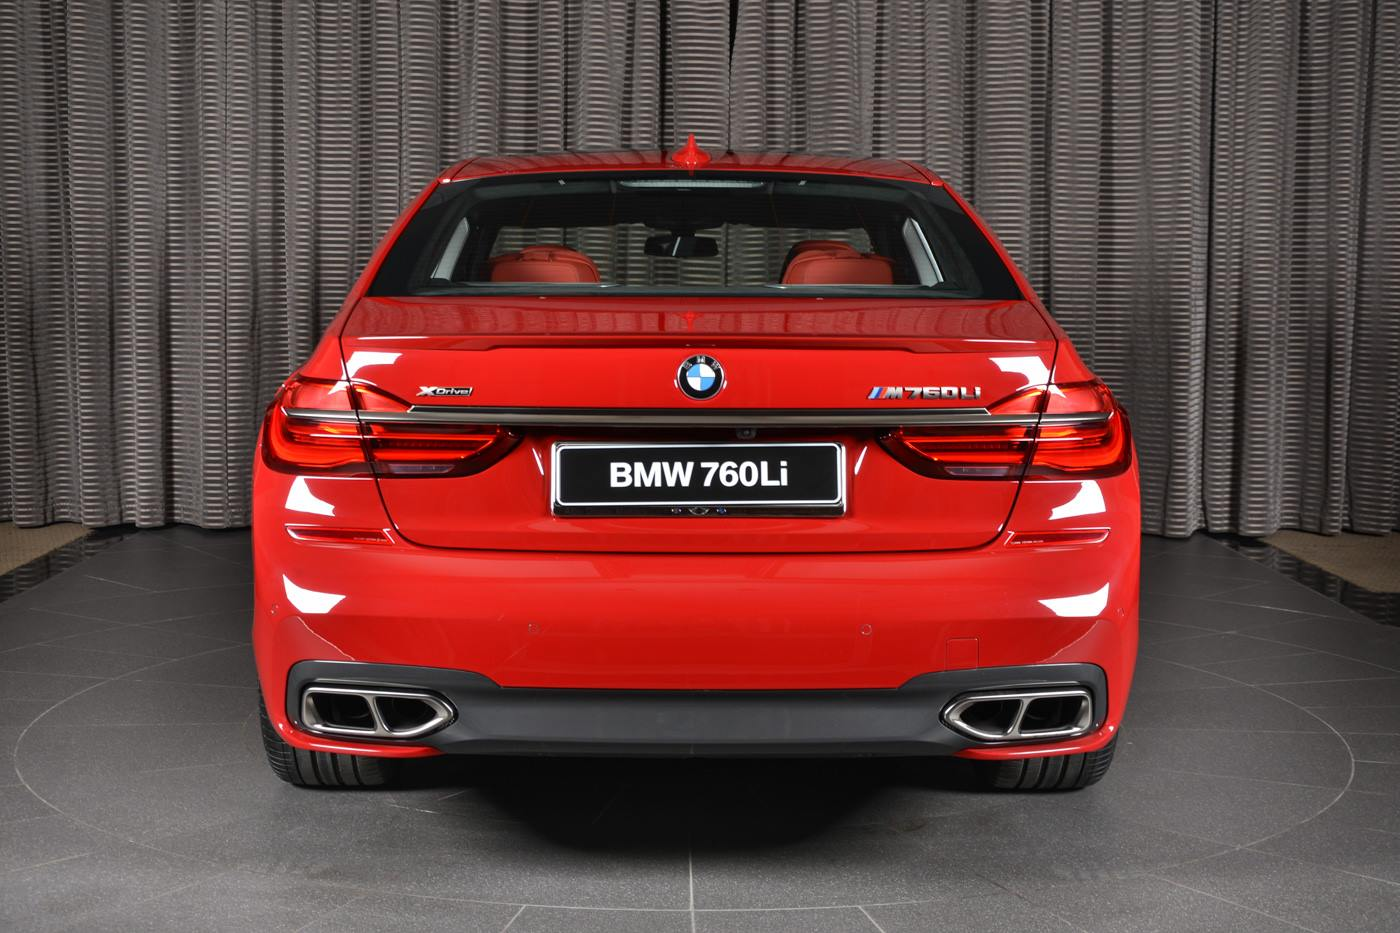 Imola Red Bmw M760li Xdrive With 3d Design Kit Looks The